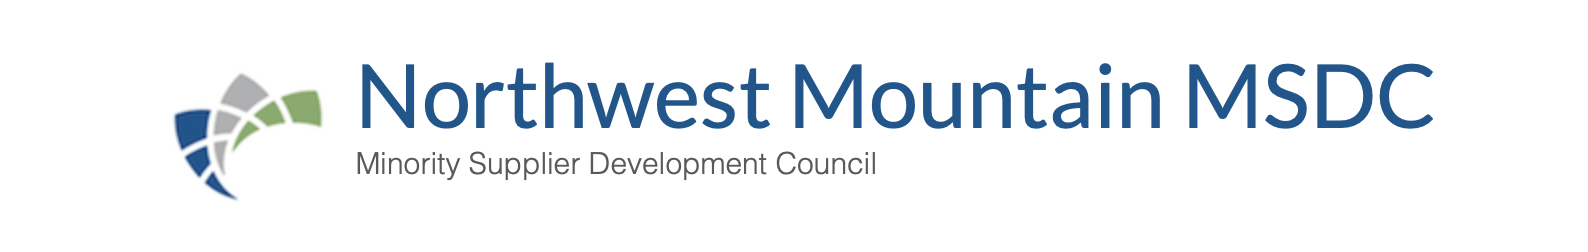 Northwest Mountain MSDC logo